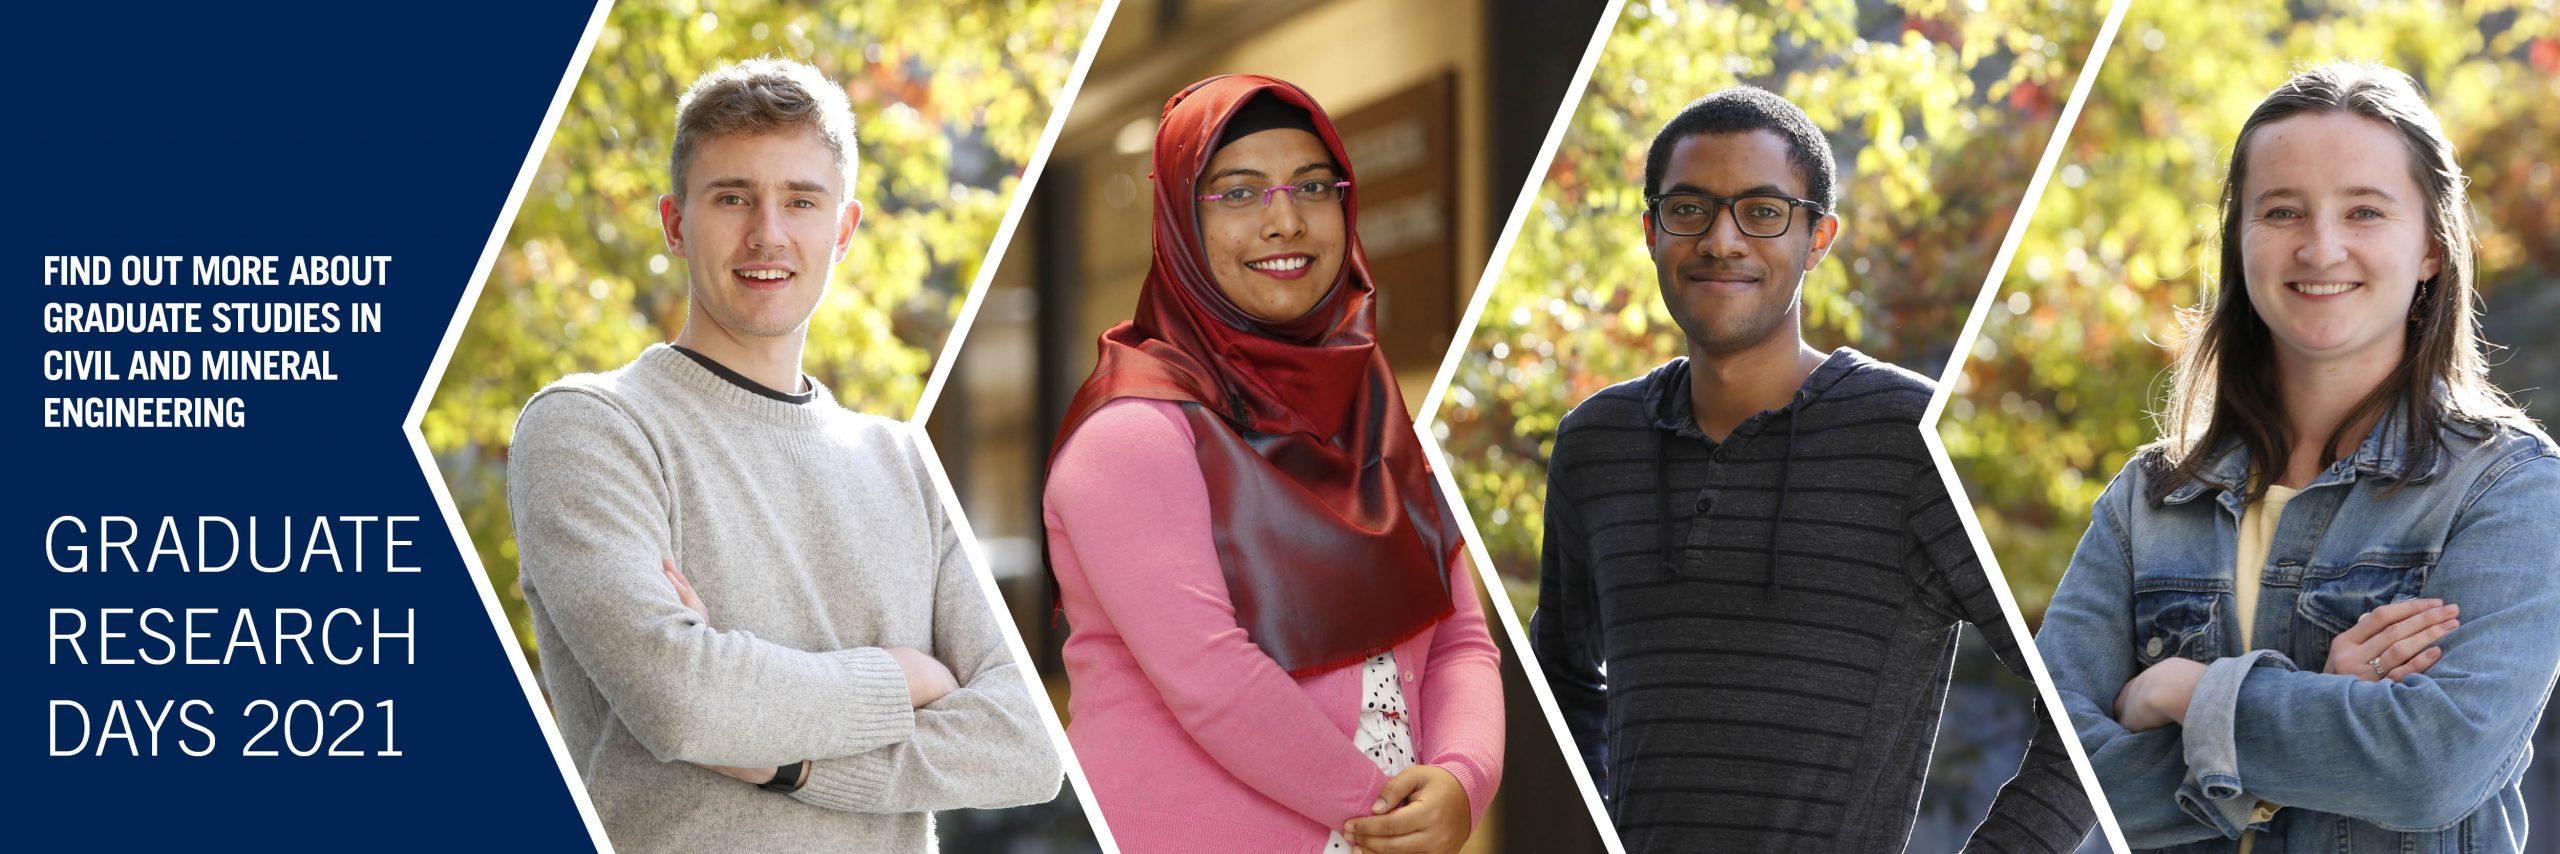 Student Testimonials for GRD 2021